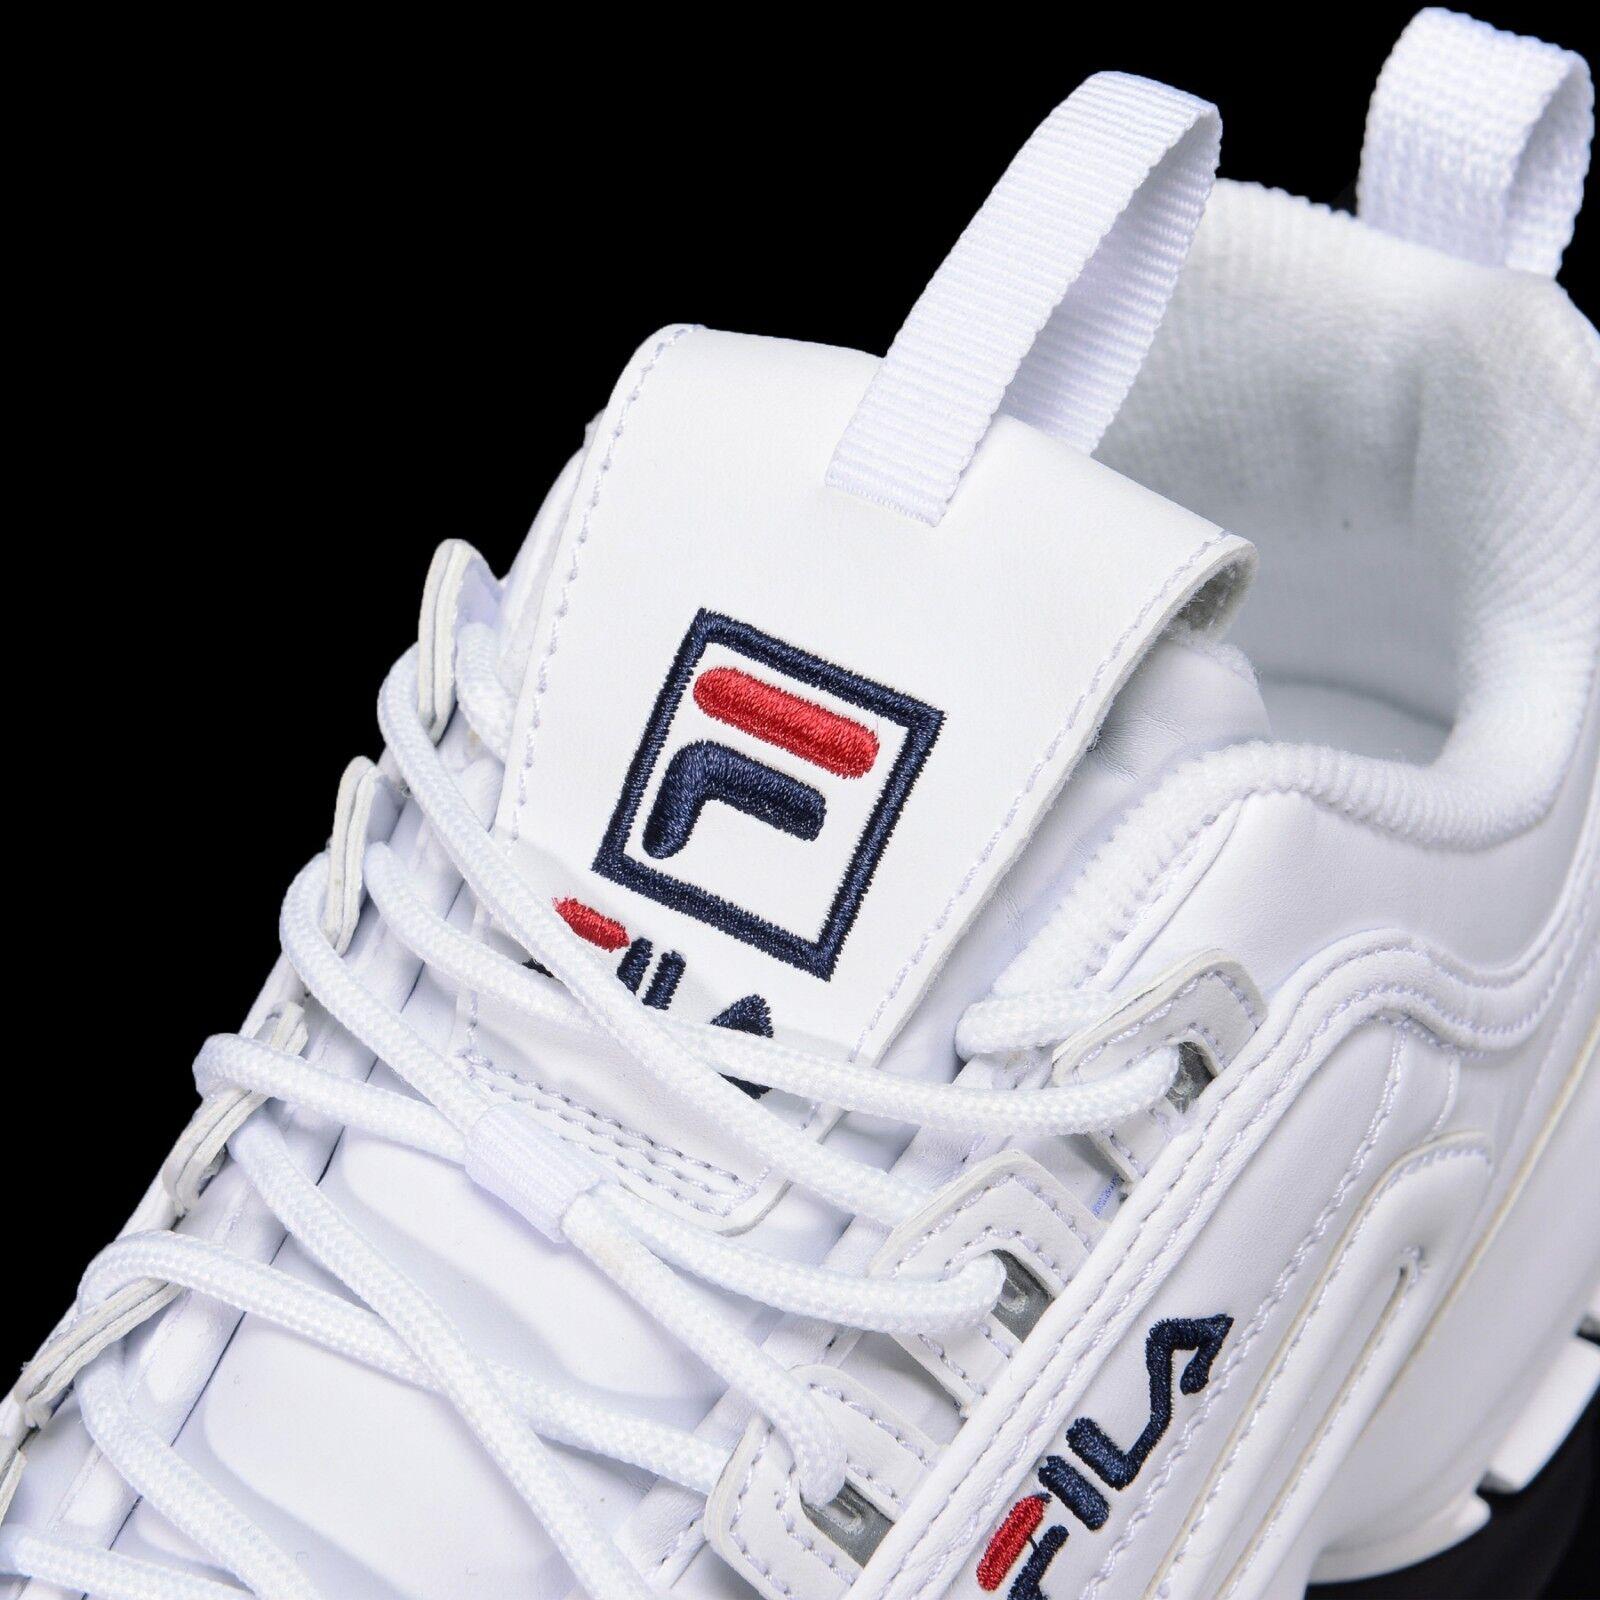 FILA Disruptor II US 2 Weiß Authentic Schuhes Unisex Größe US II 4-11 FS1HTA1071X_WWT f9cc4a